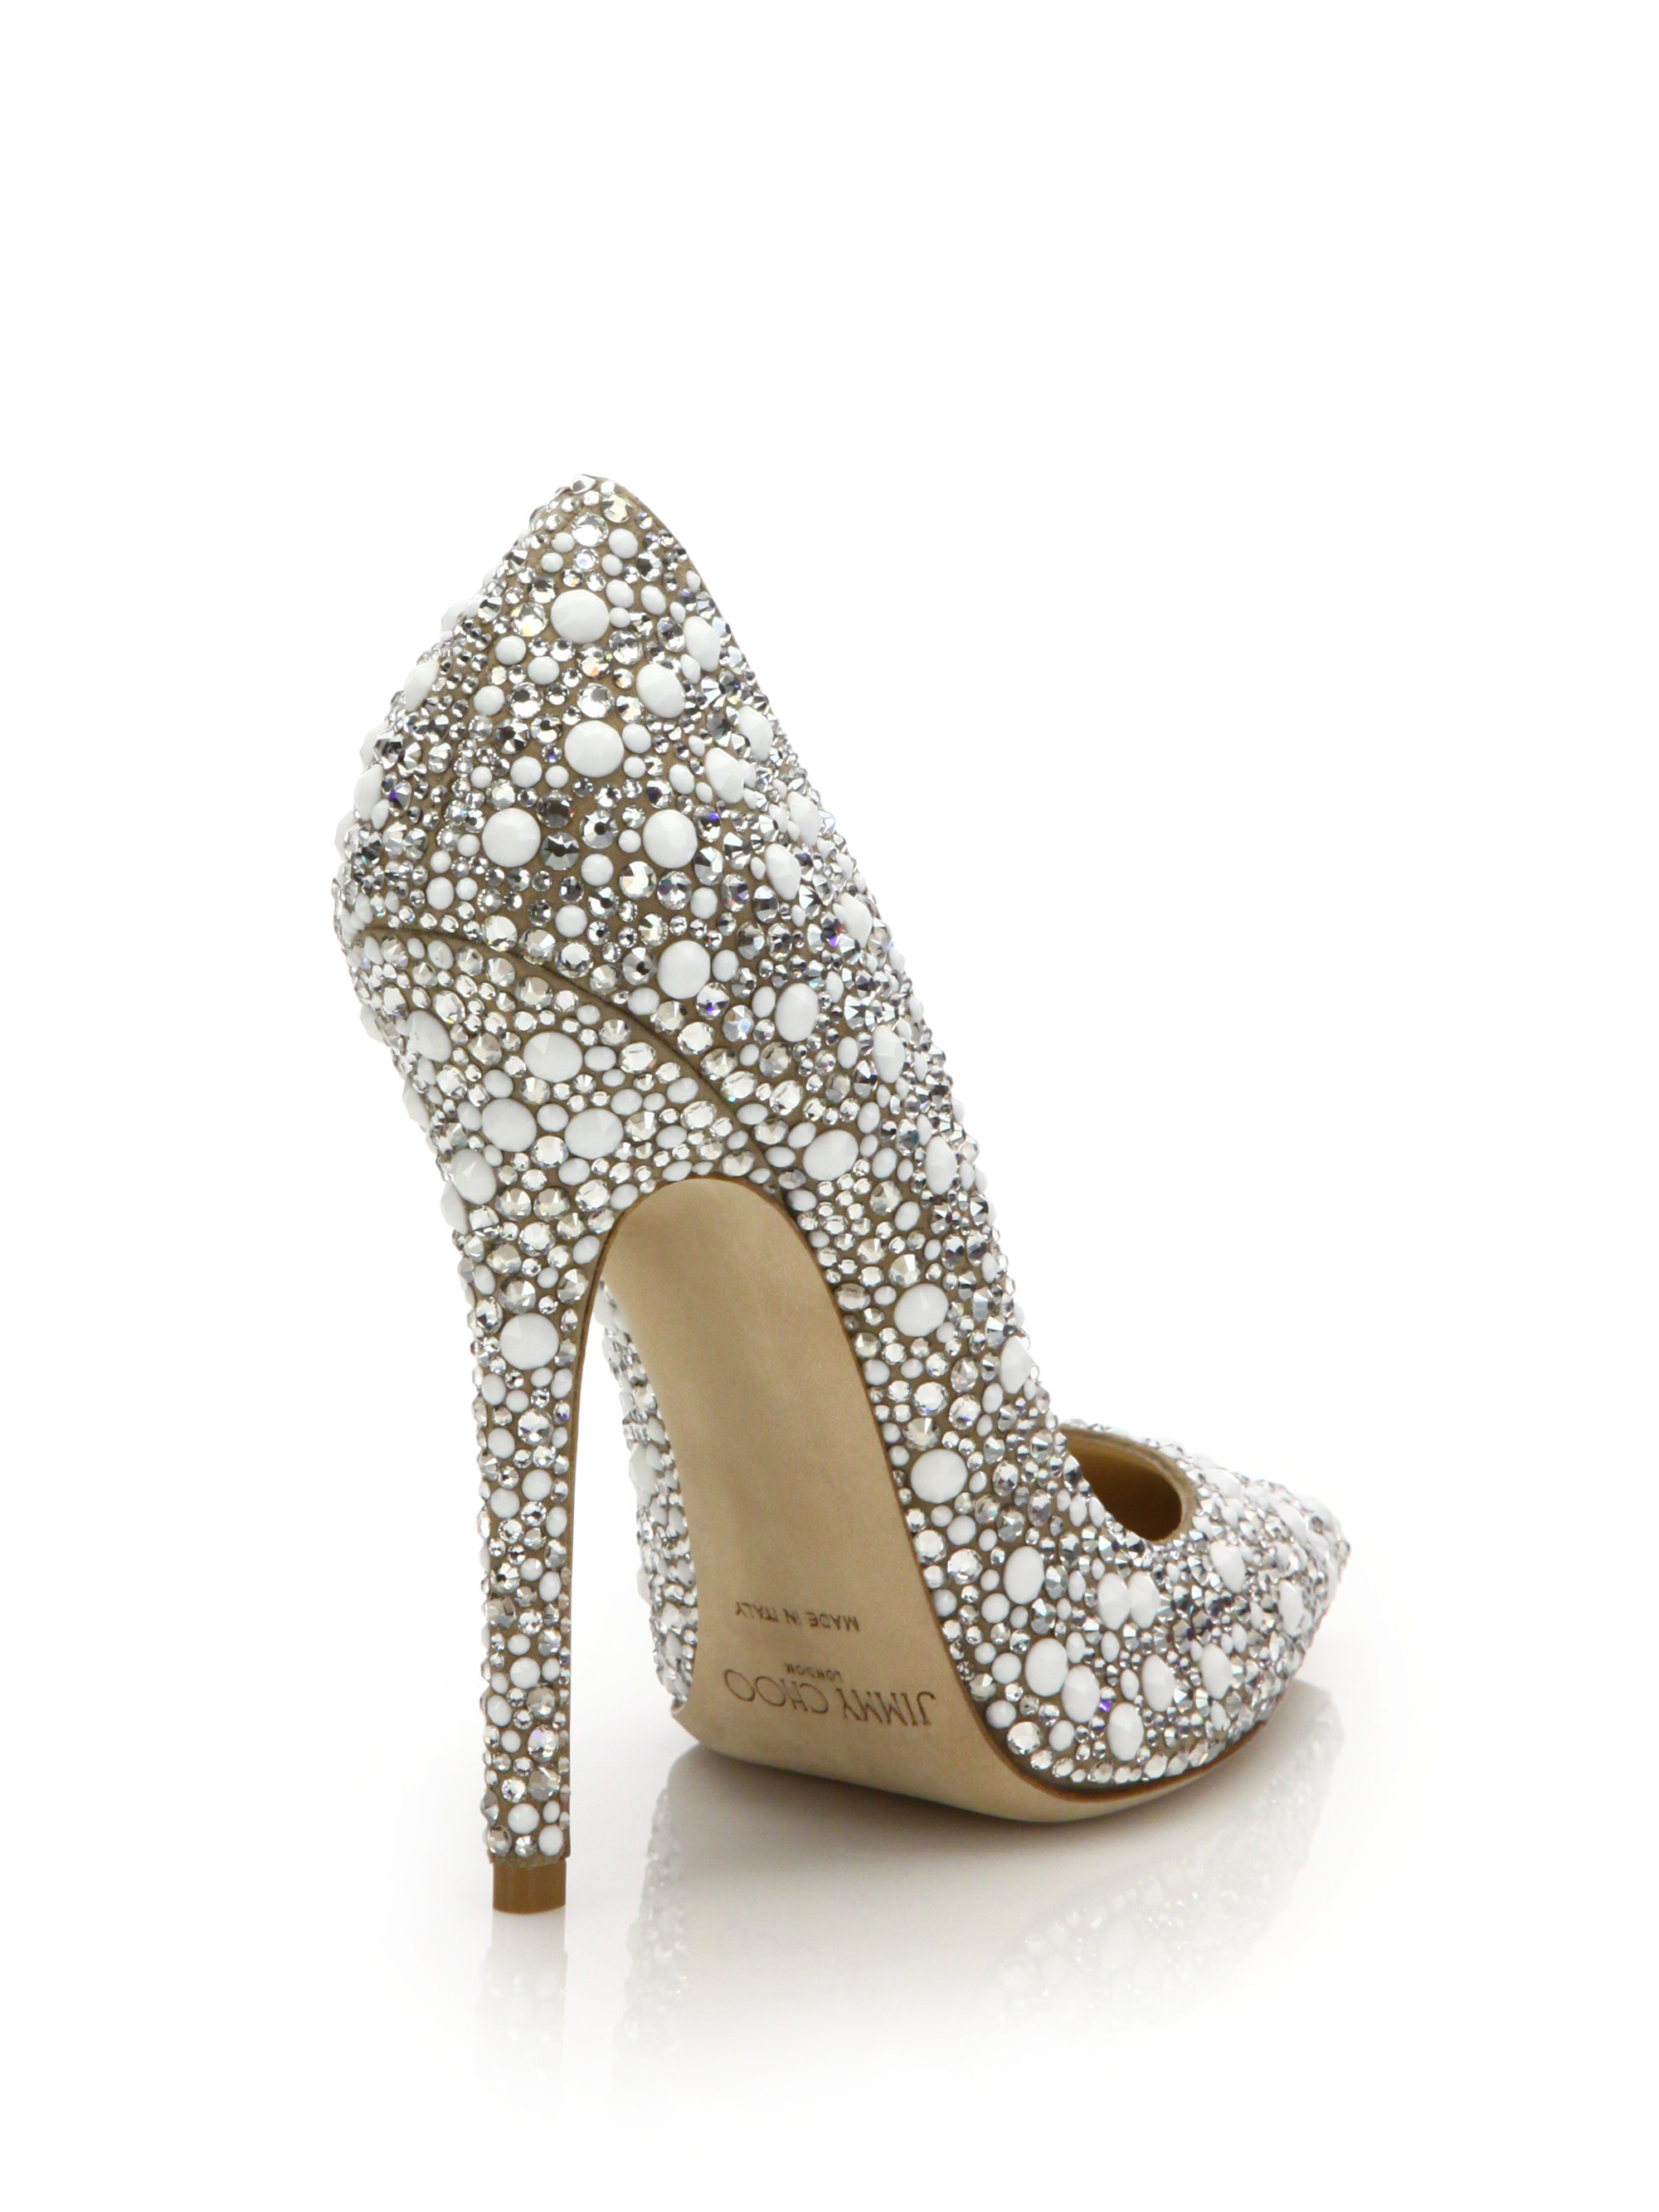 Saks Fifth Avenue Bridal